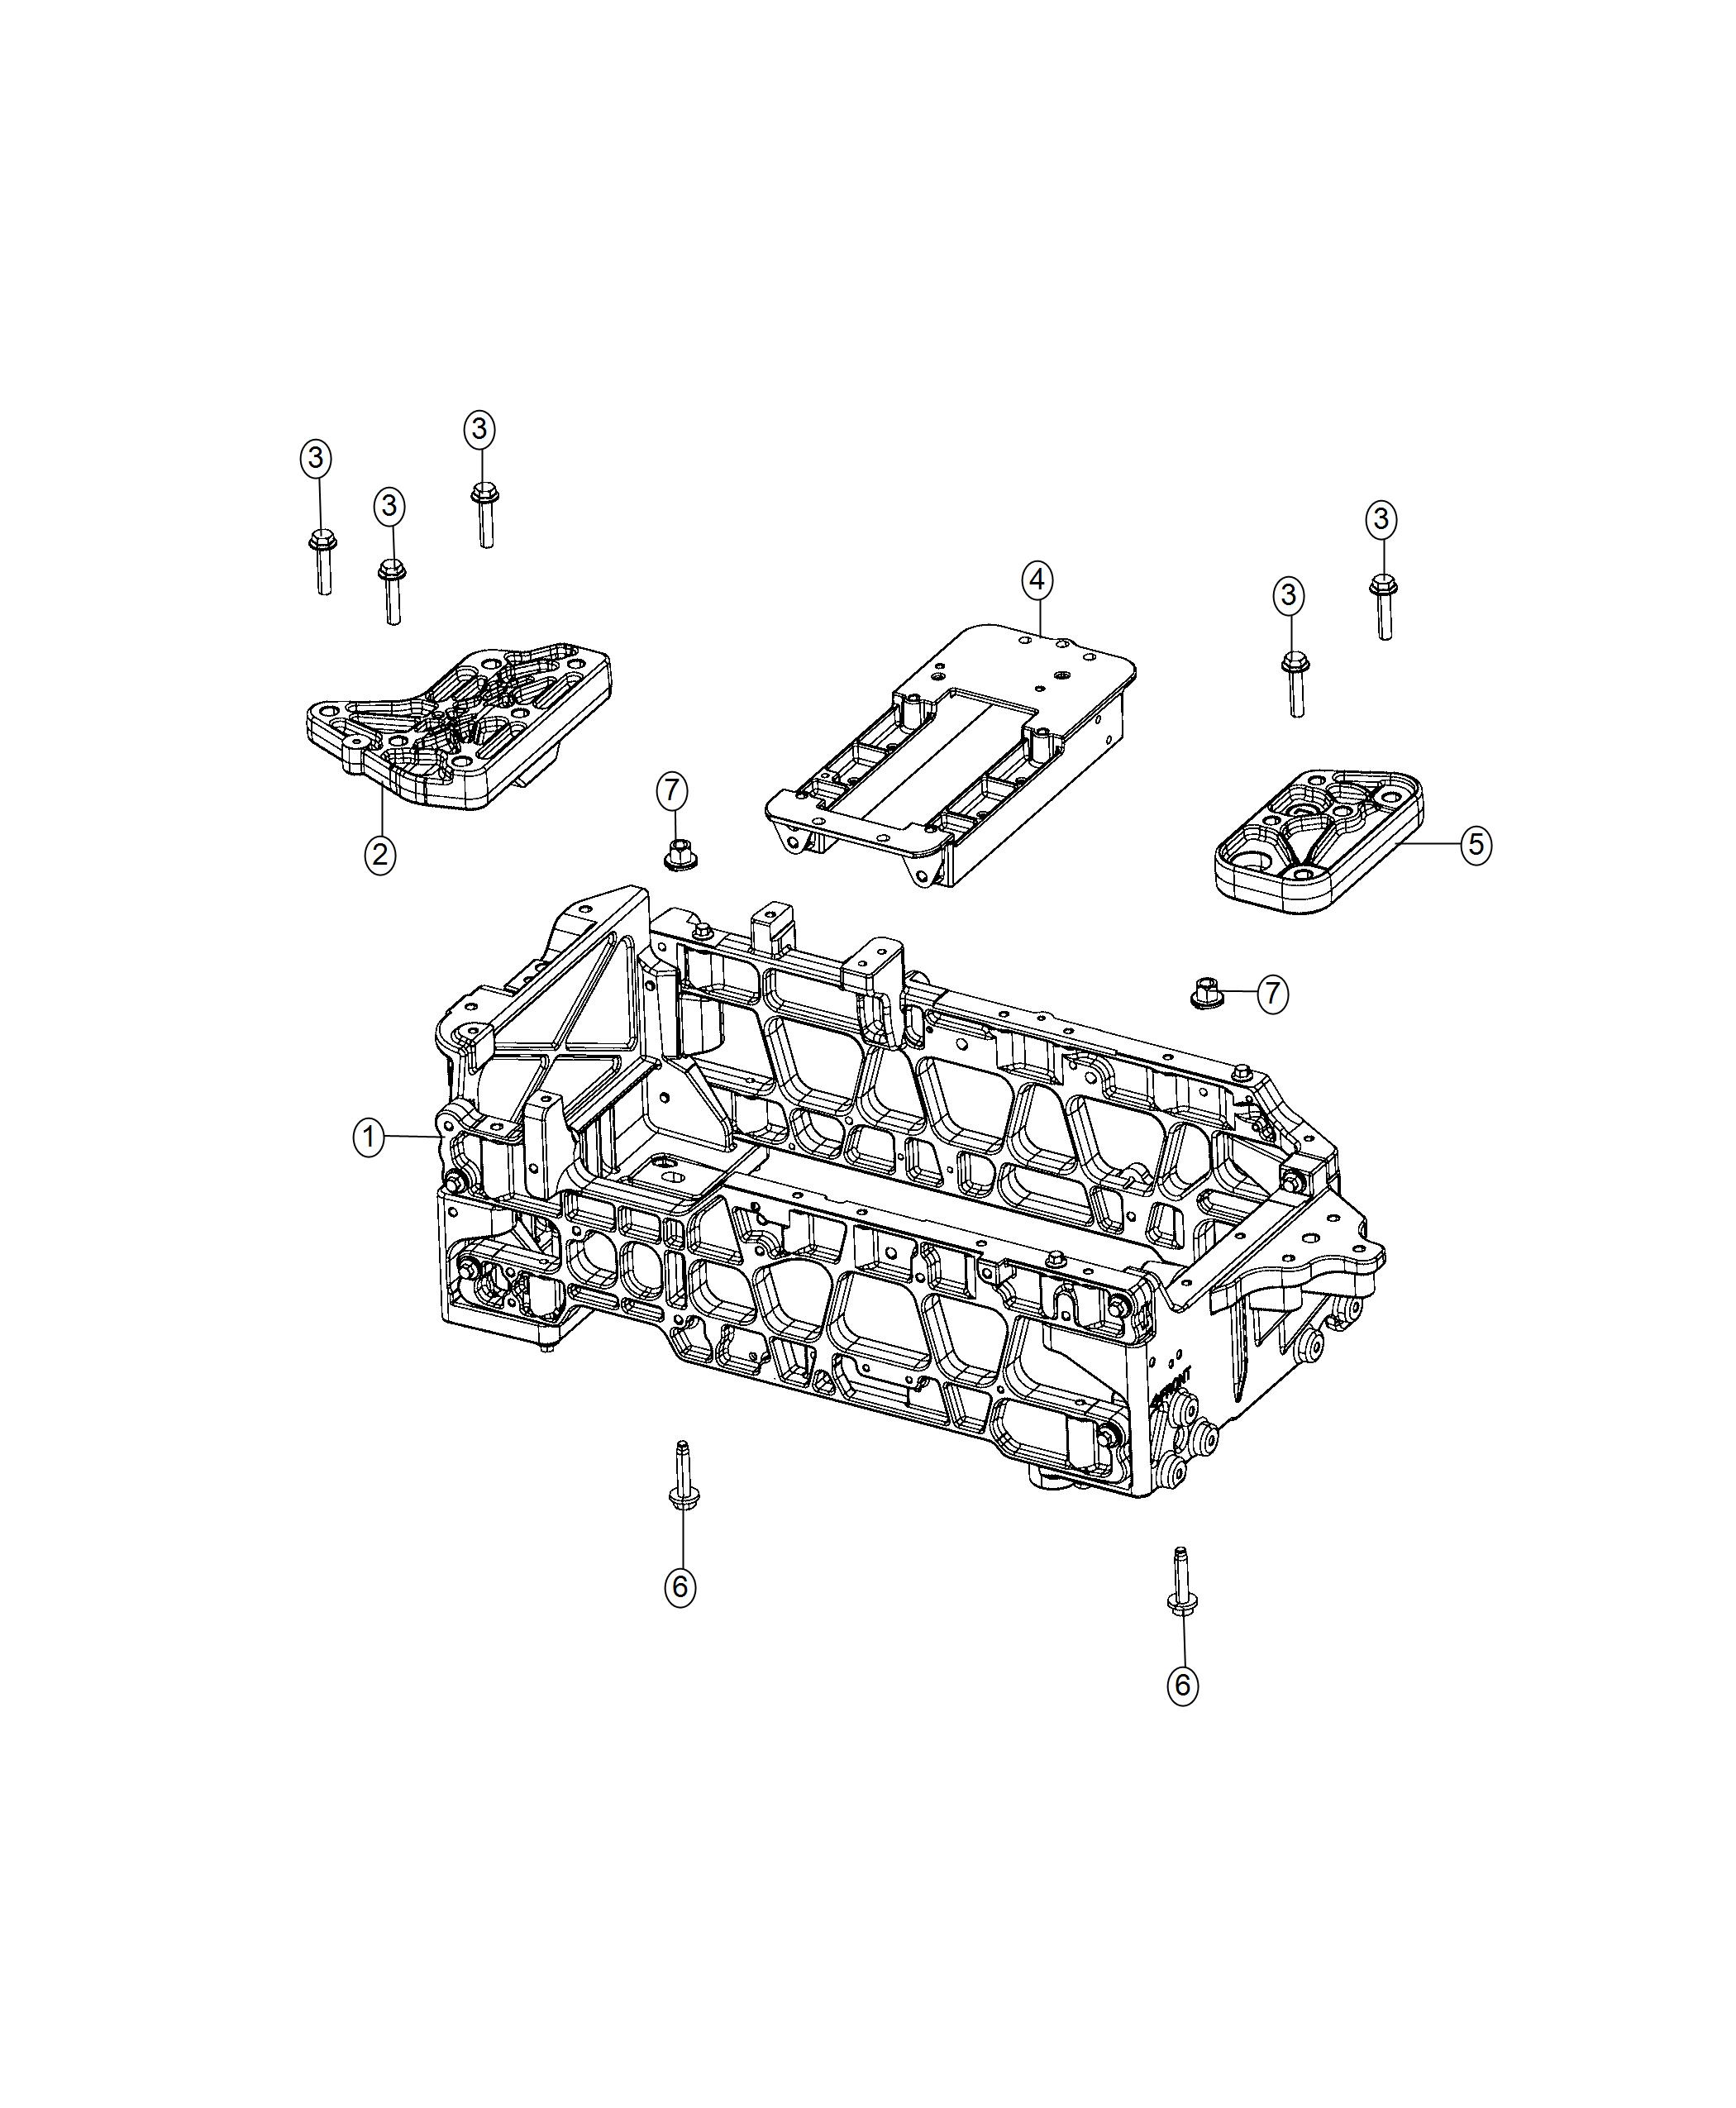 Fiat 500e Cradle Powertrain Electric